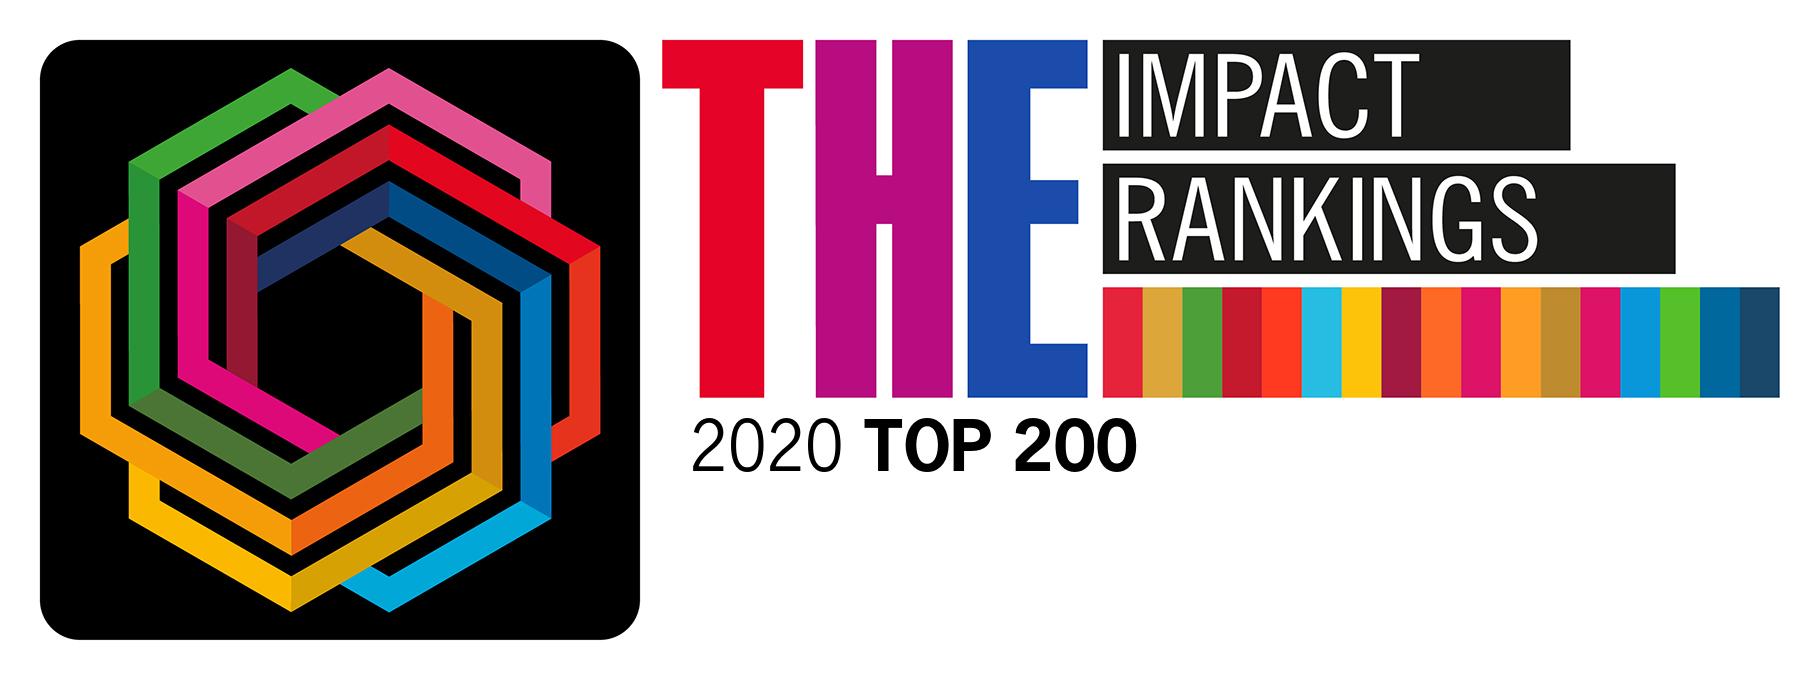 The Impact Rankings Logo